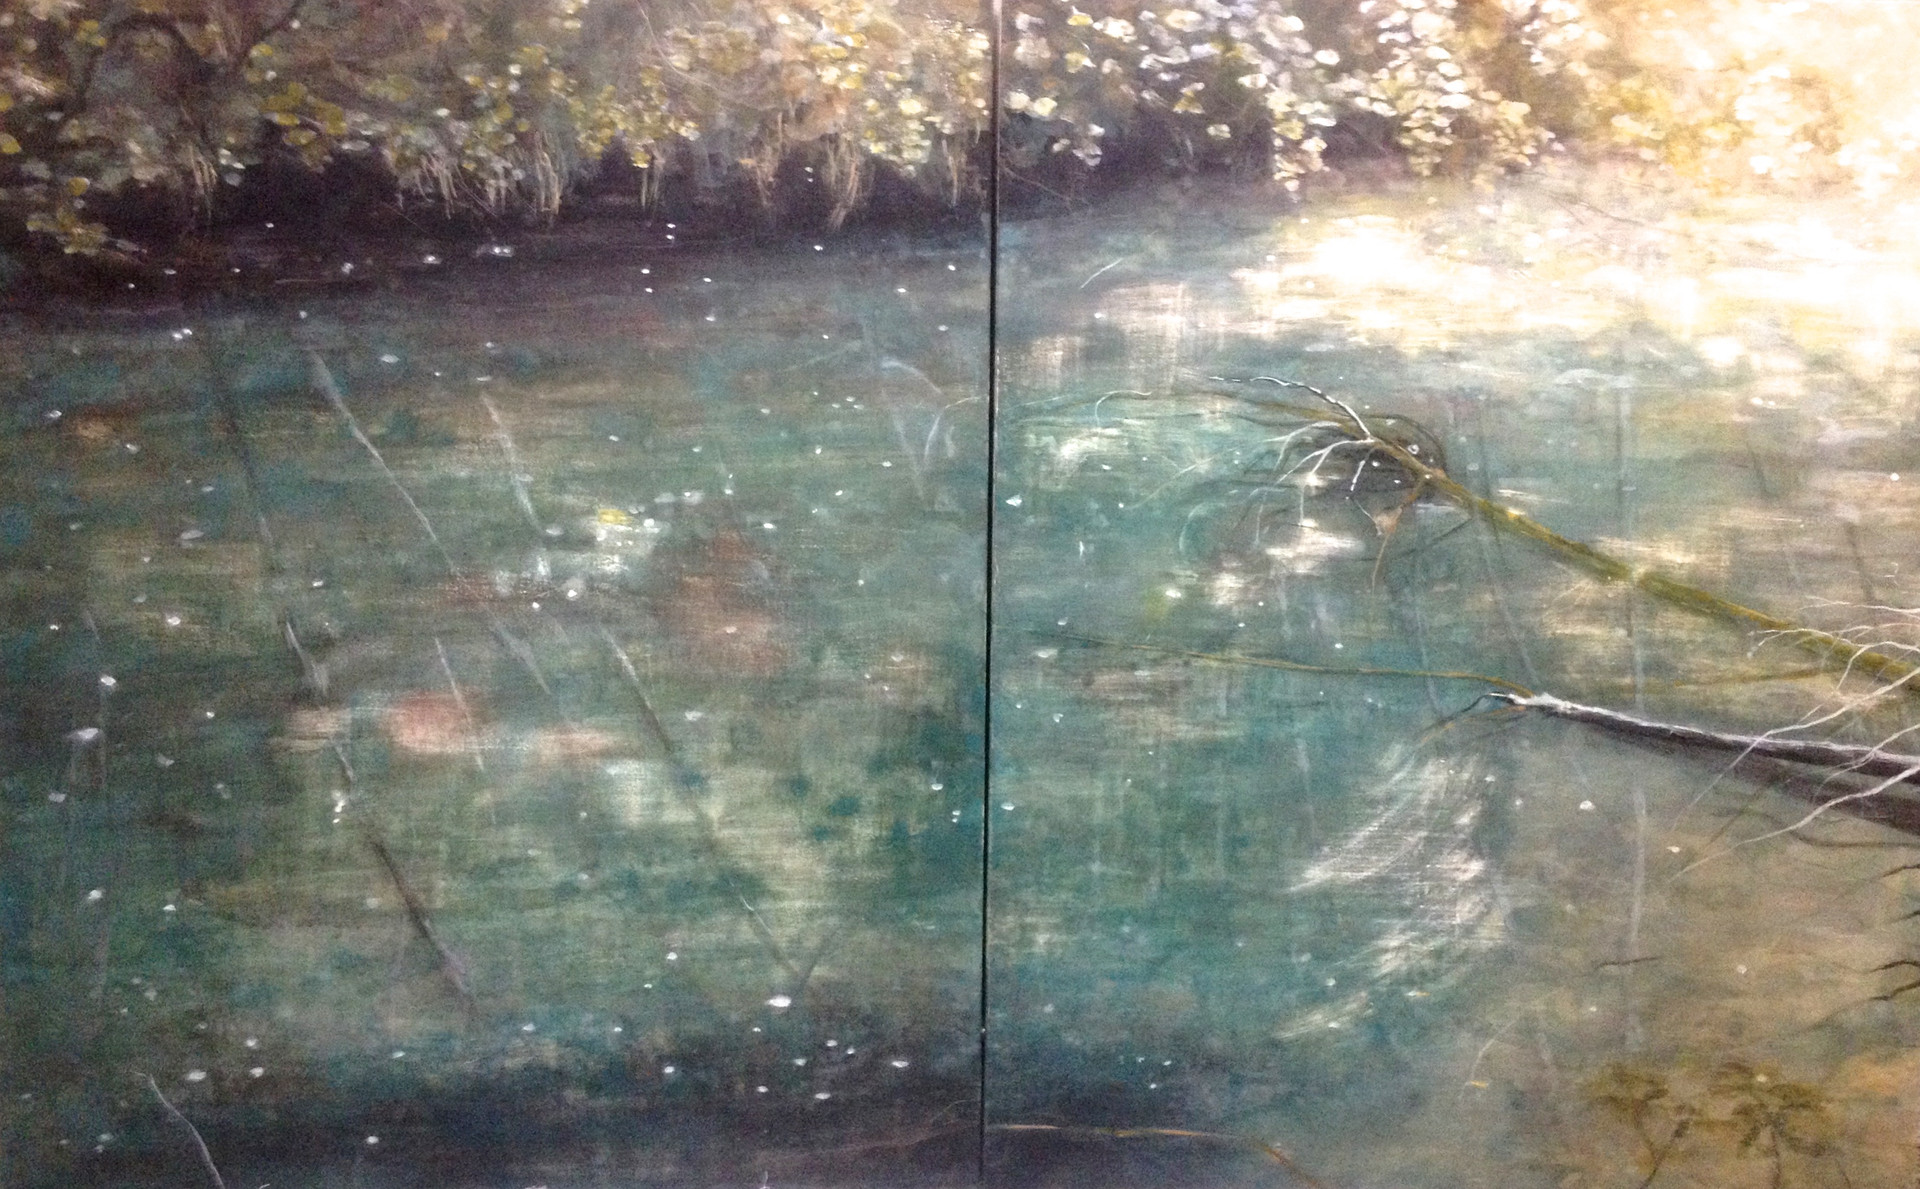 ISOLA SANTA Tempera grassa on wooden panel (diptych) 140x180cm (private collection) 2015